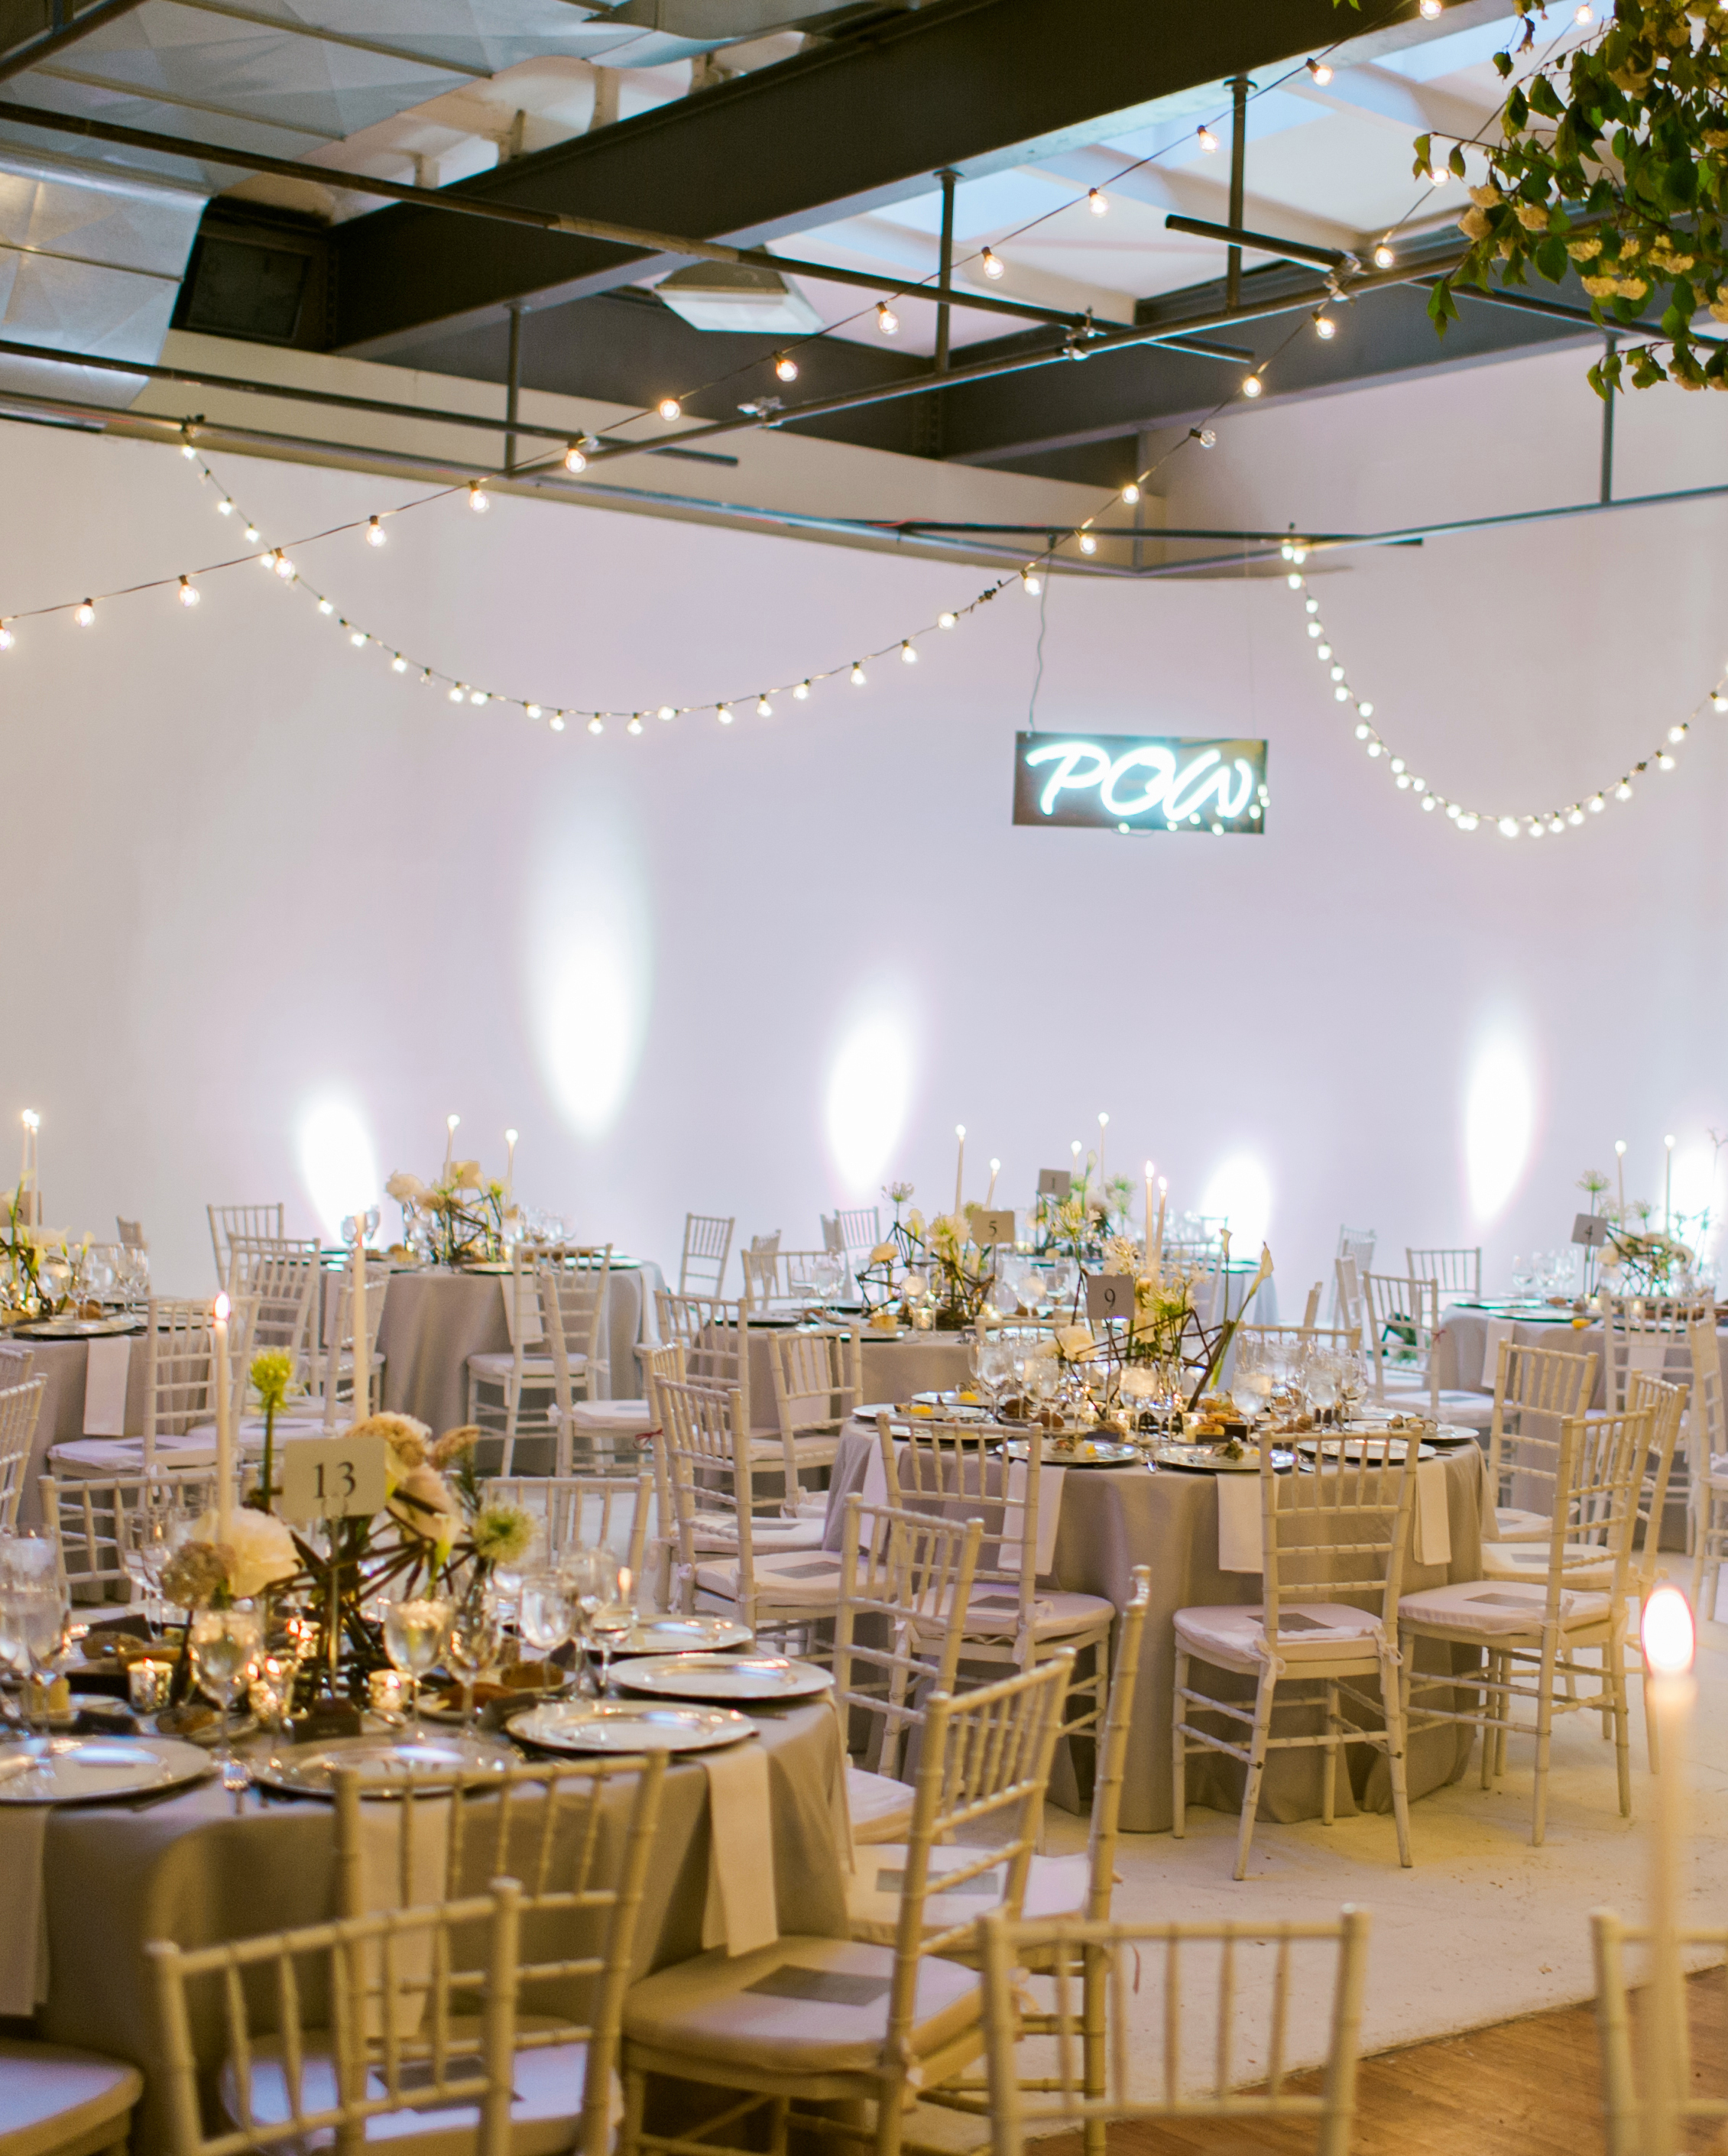 amy-sheldon-wedding-reception-0291-s112088-0815.jpg